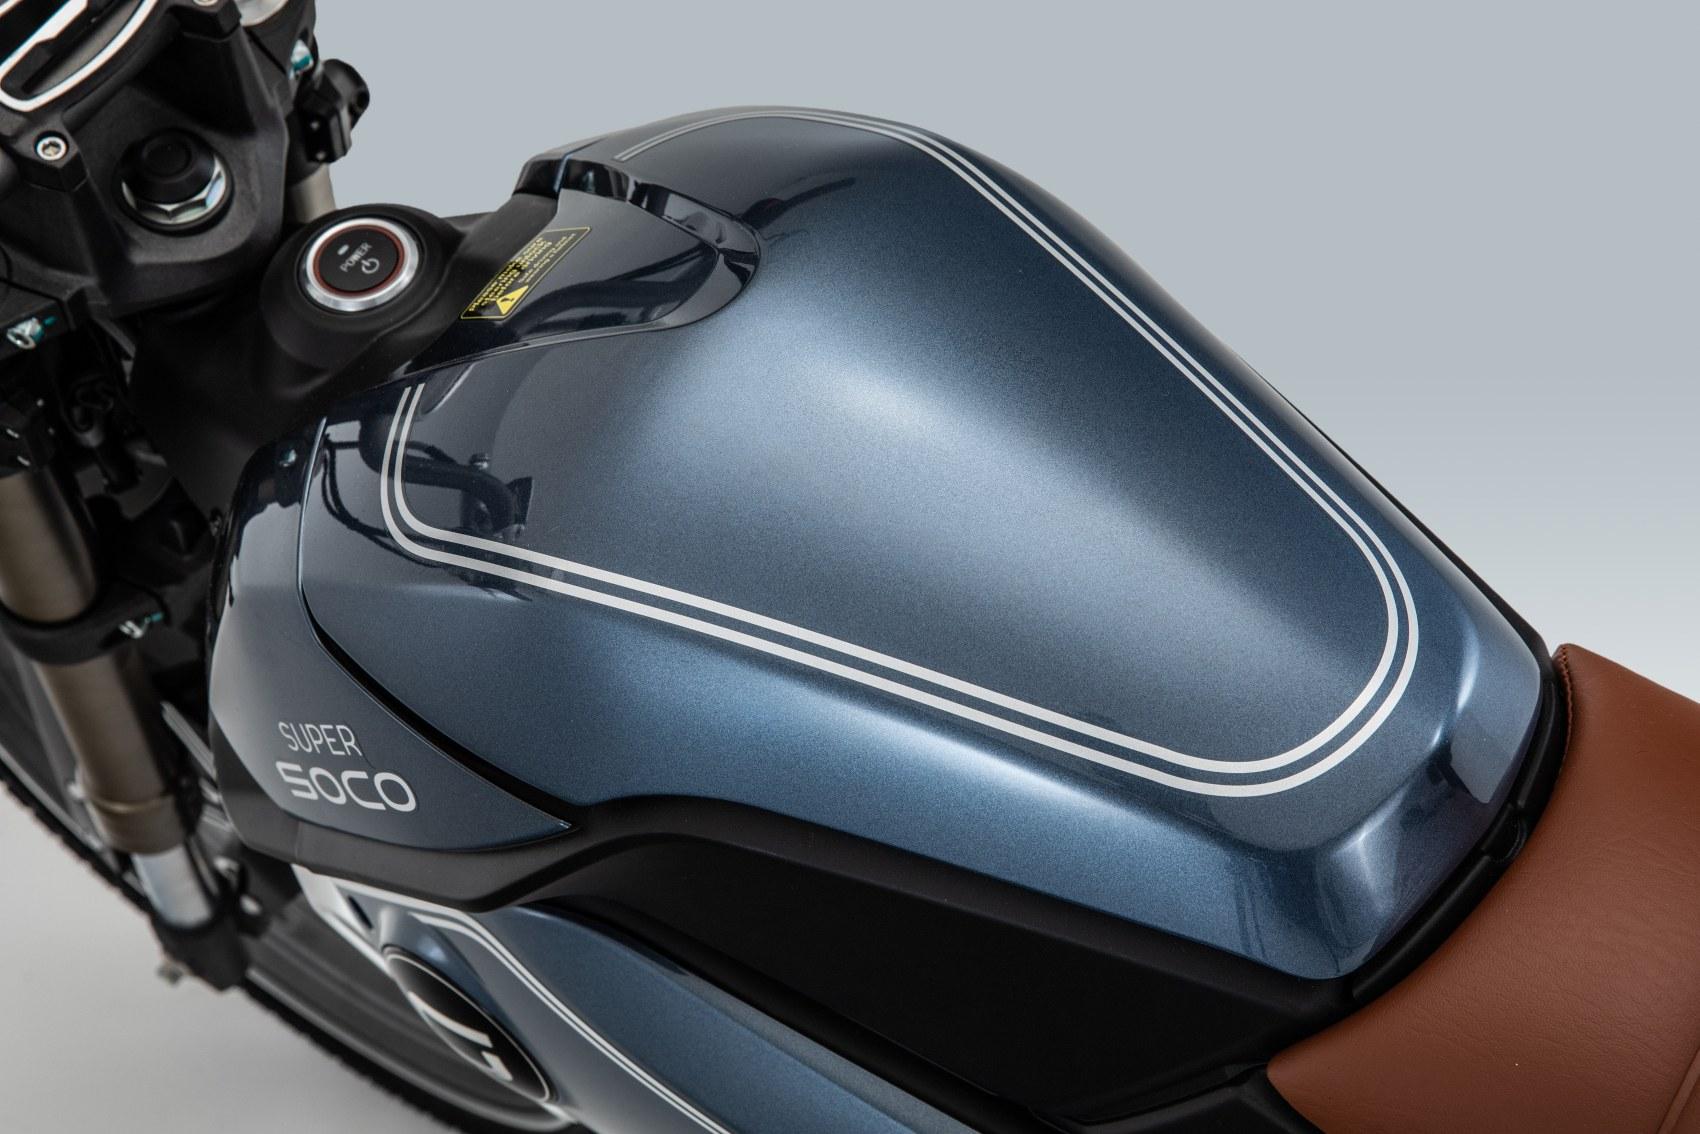 Super Soco TC electric motorcycle tank